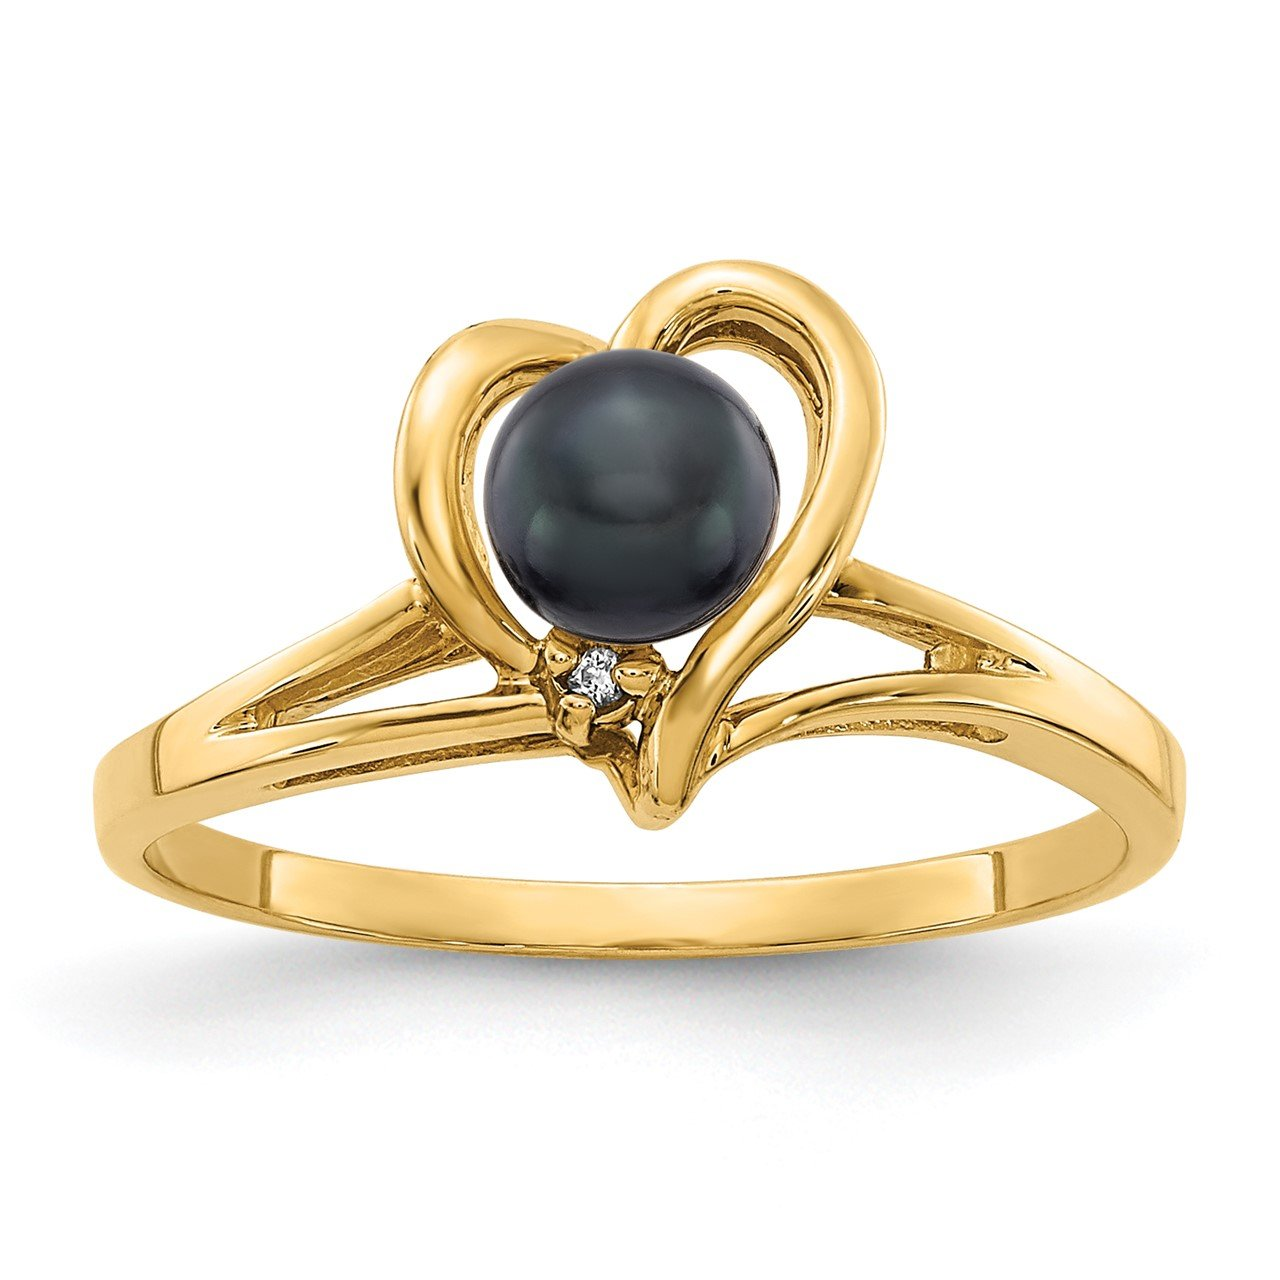 14k 4.5mm Black FW Cultured Pearl AA Diamond ring